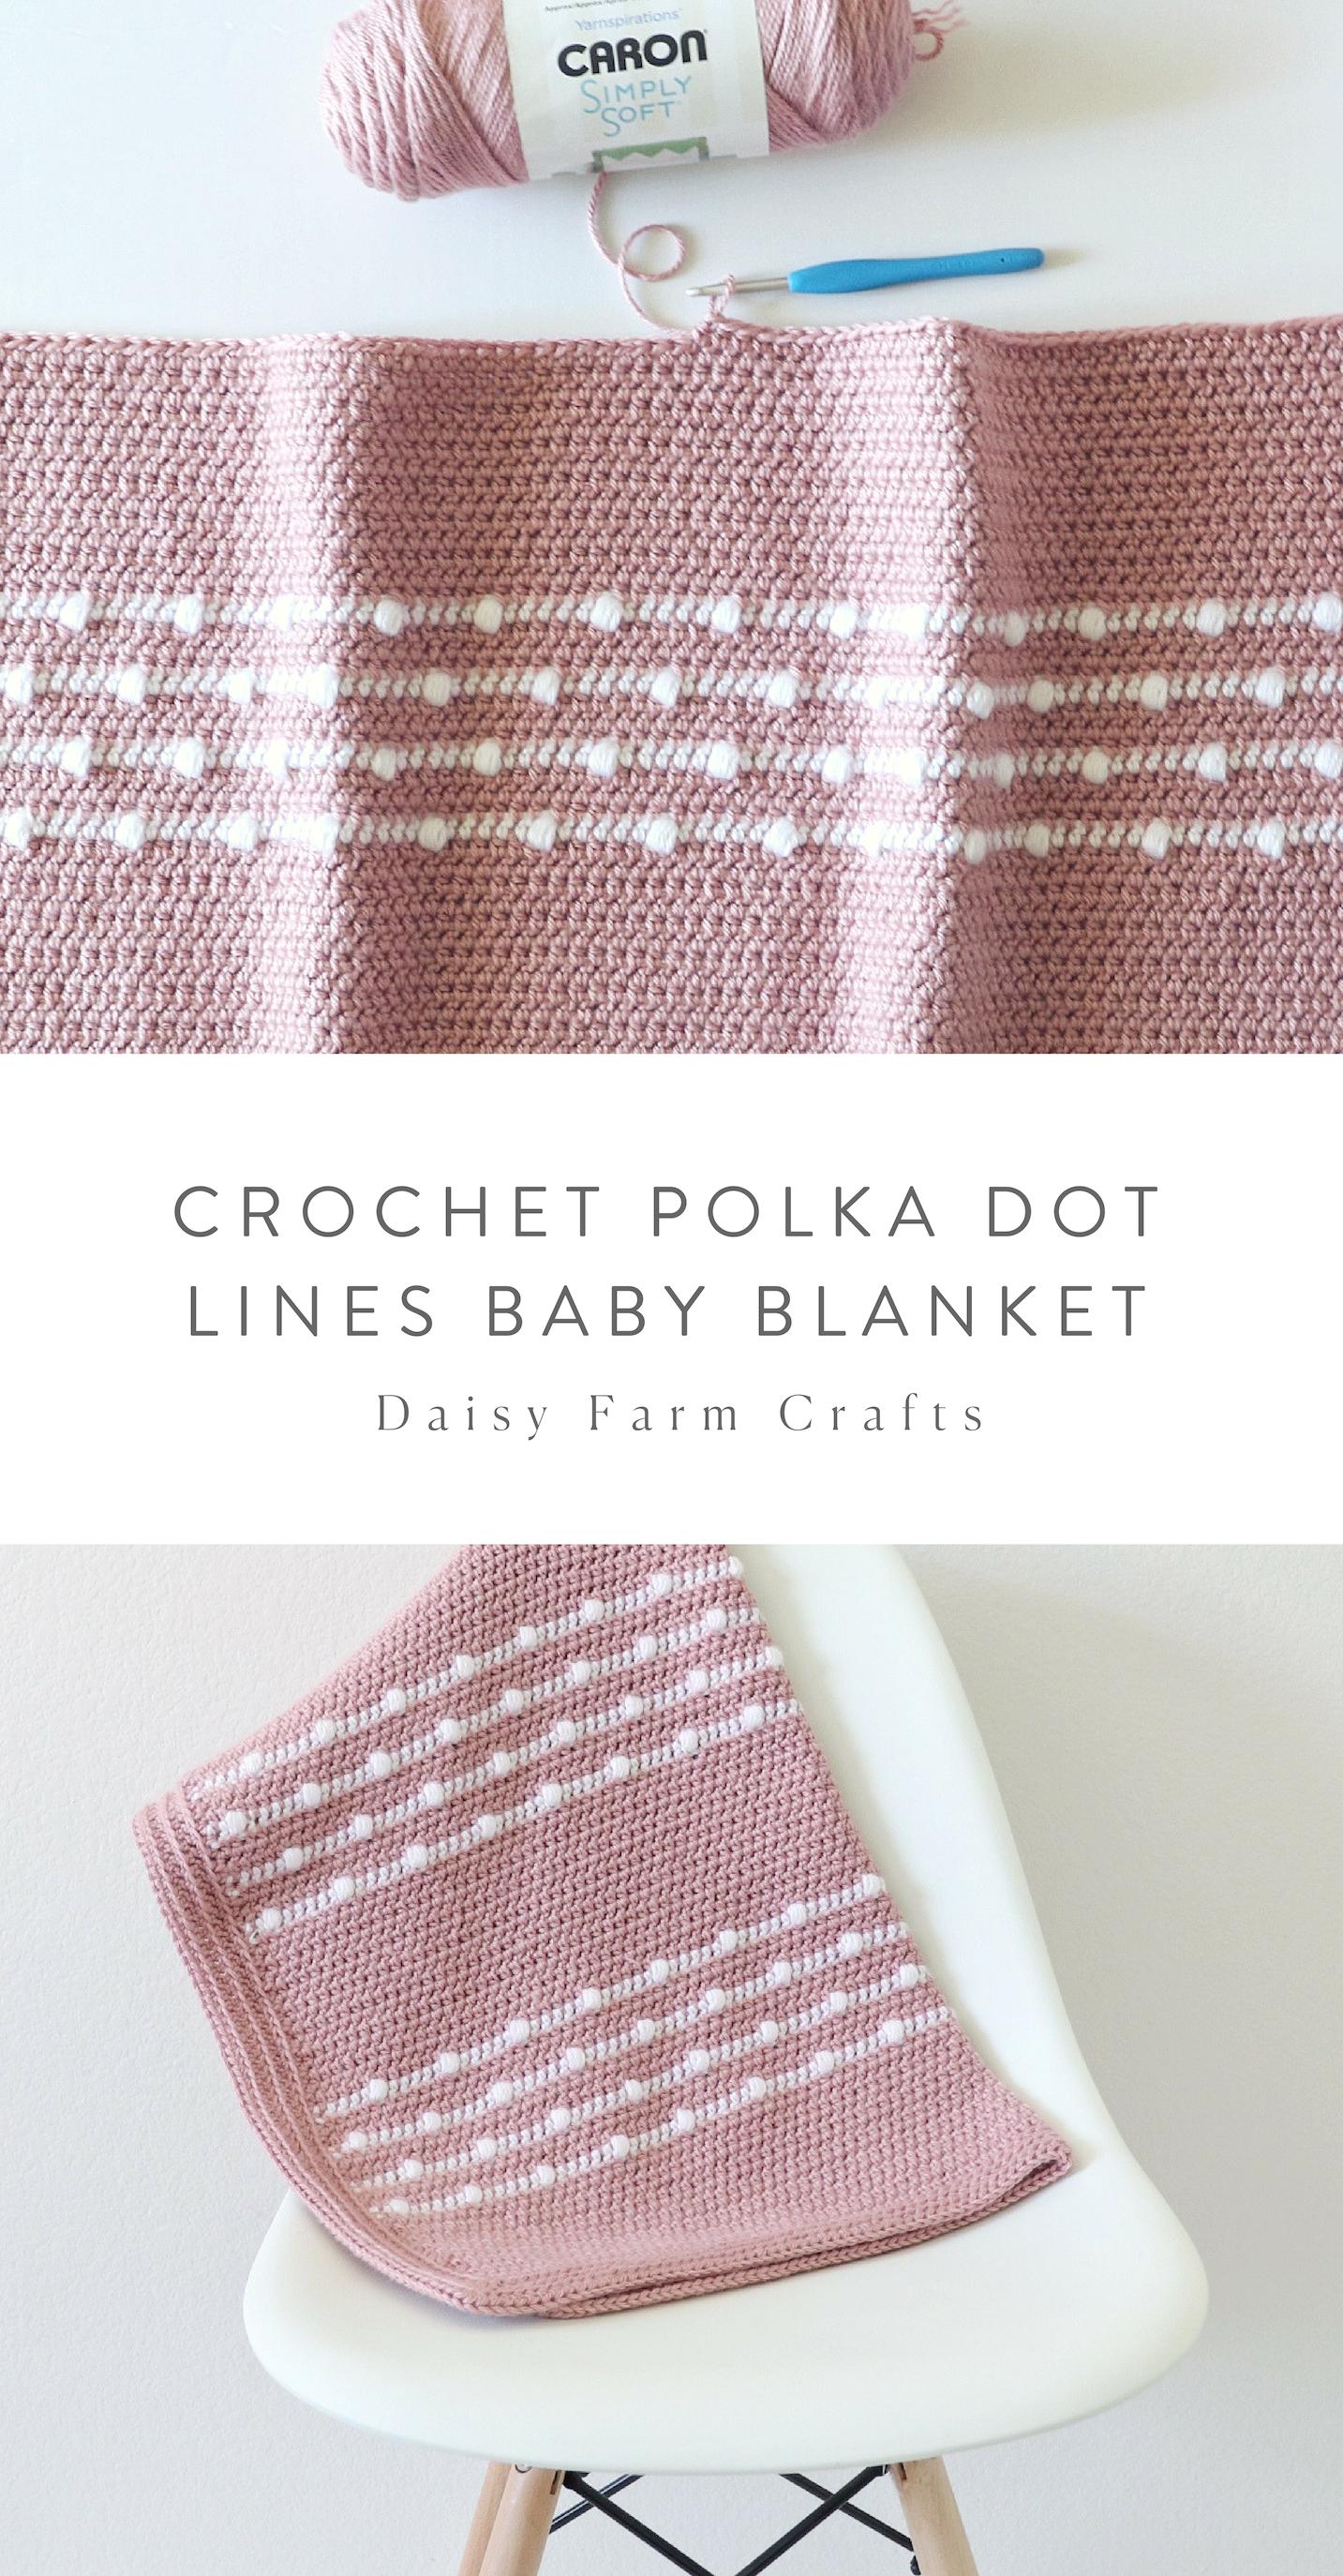 Free Pattern  Crochet Polka Dot Lines Baby Blanket  Crochet Patterns